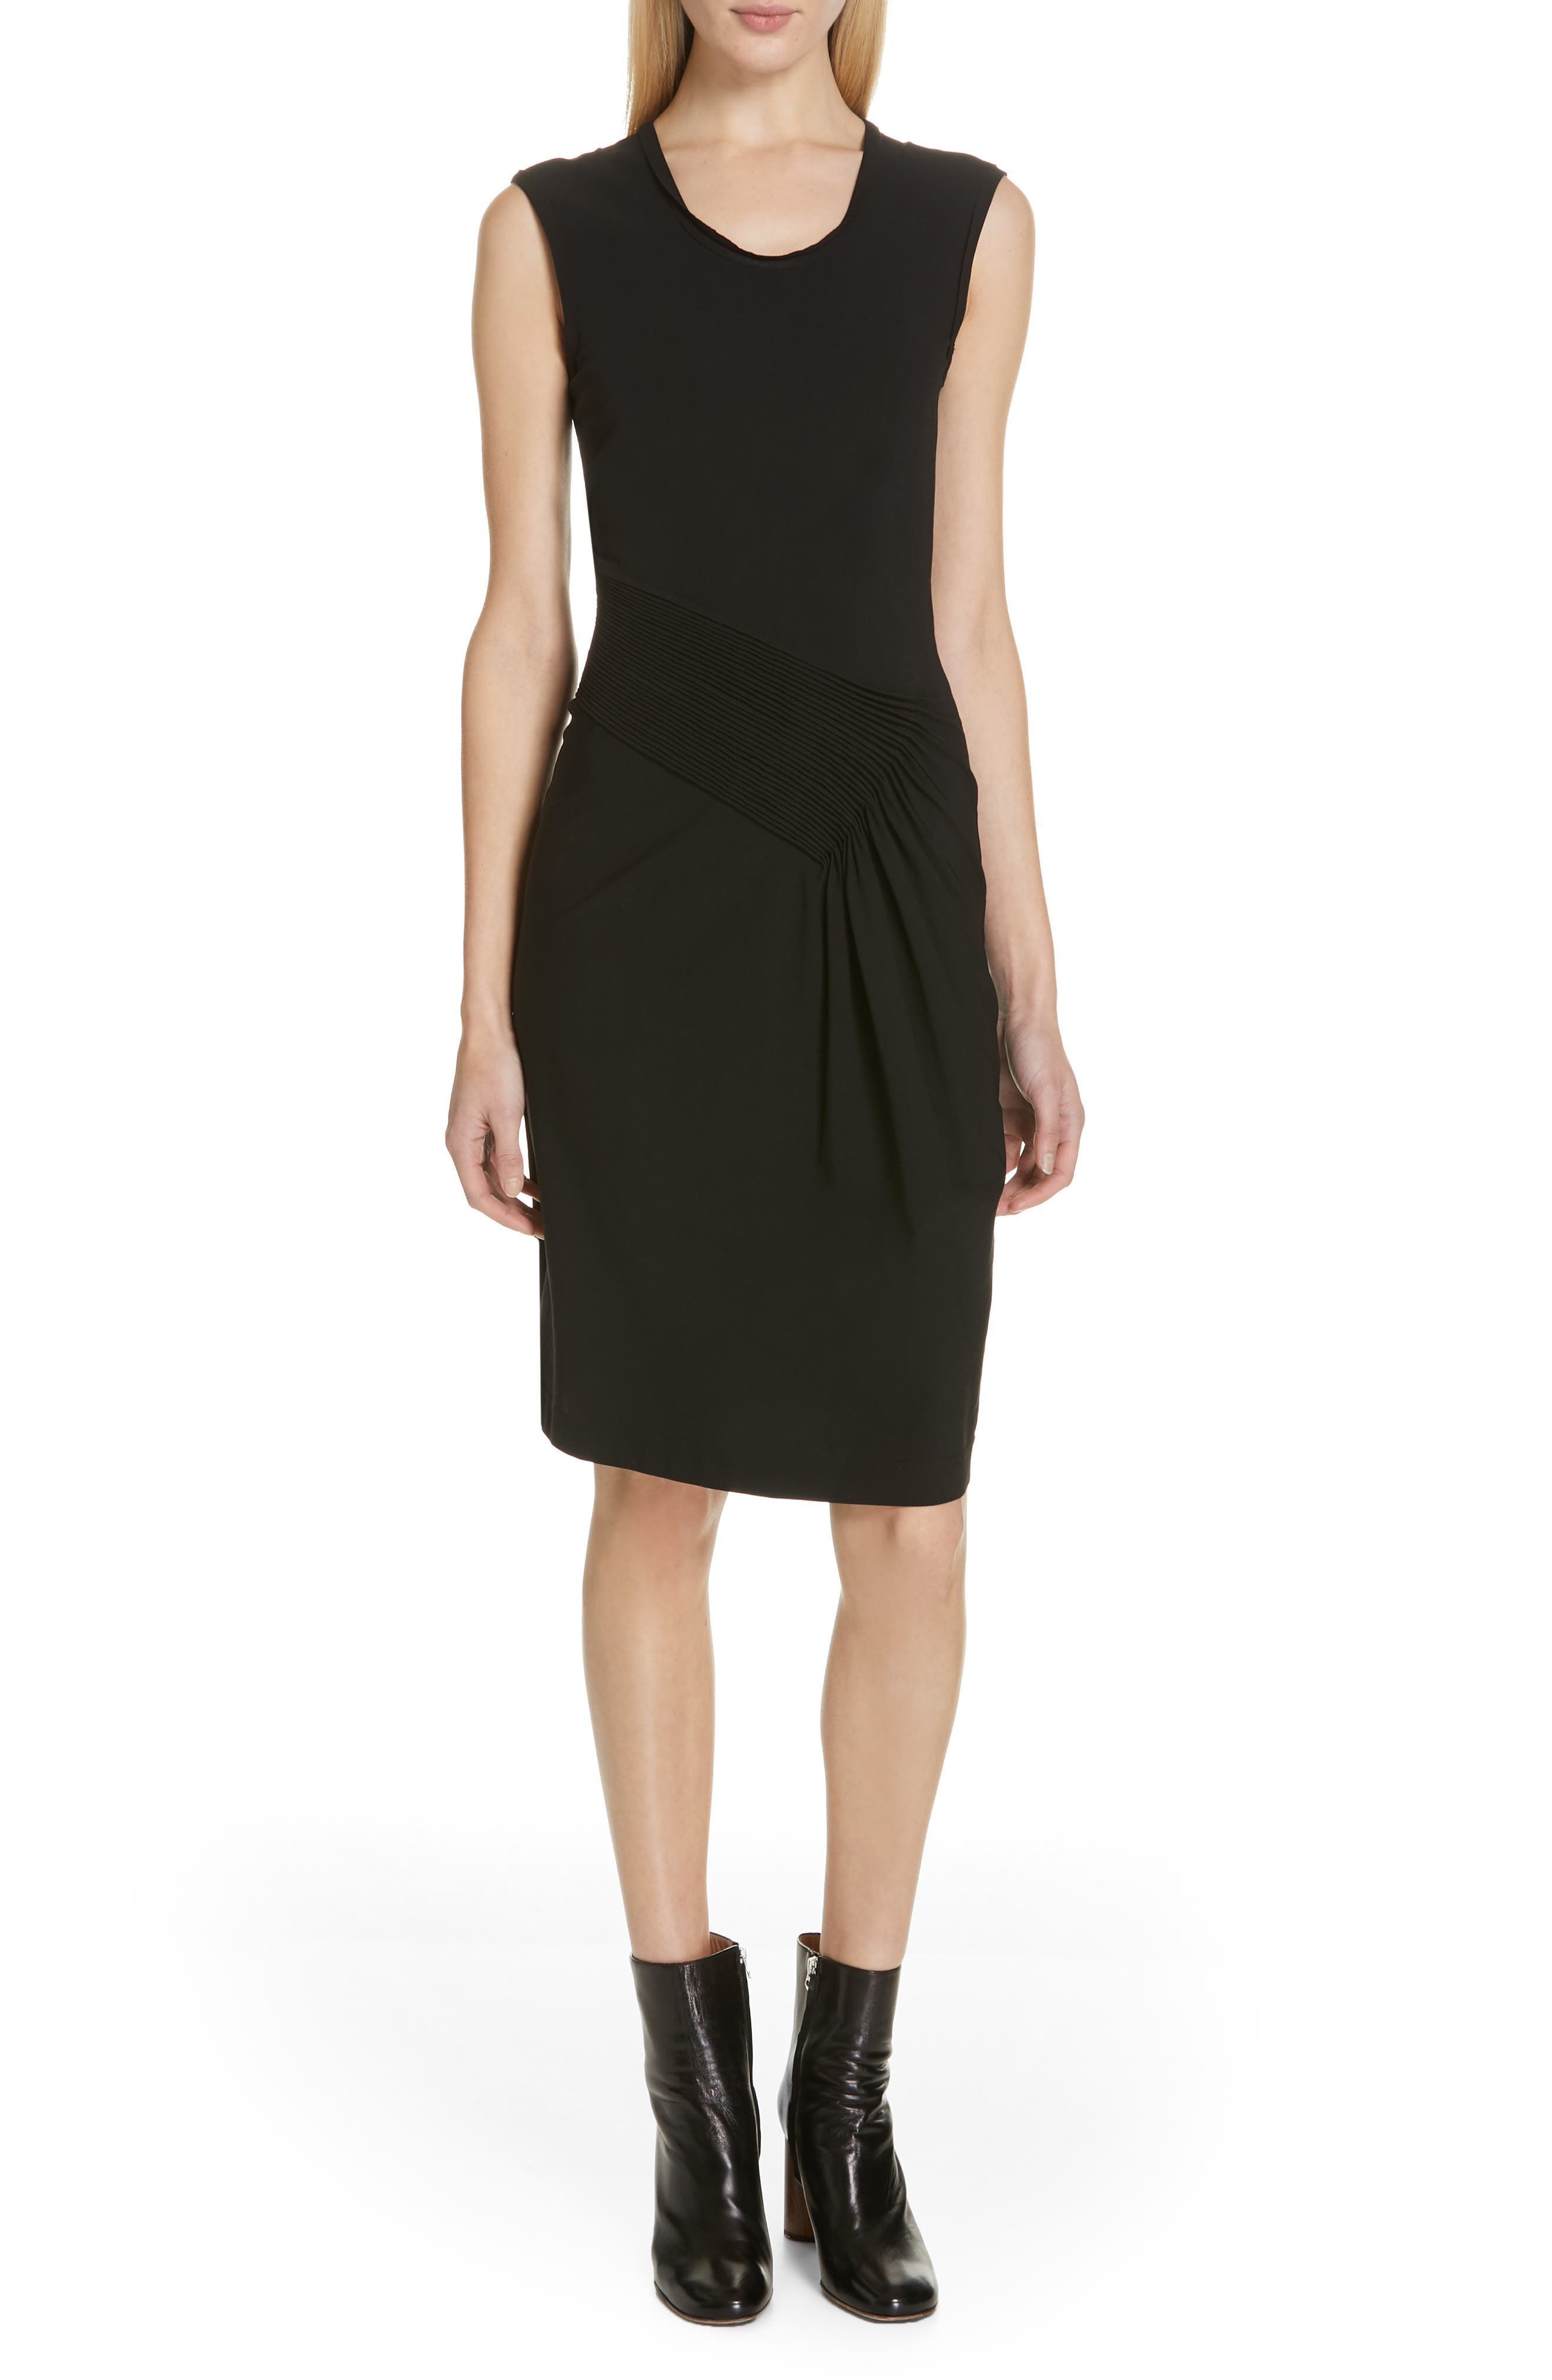 HELMUT LANG, Pleated Jersey Dress, Main thumbnail 1, color, BLACK